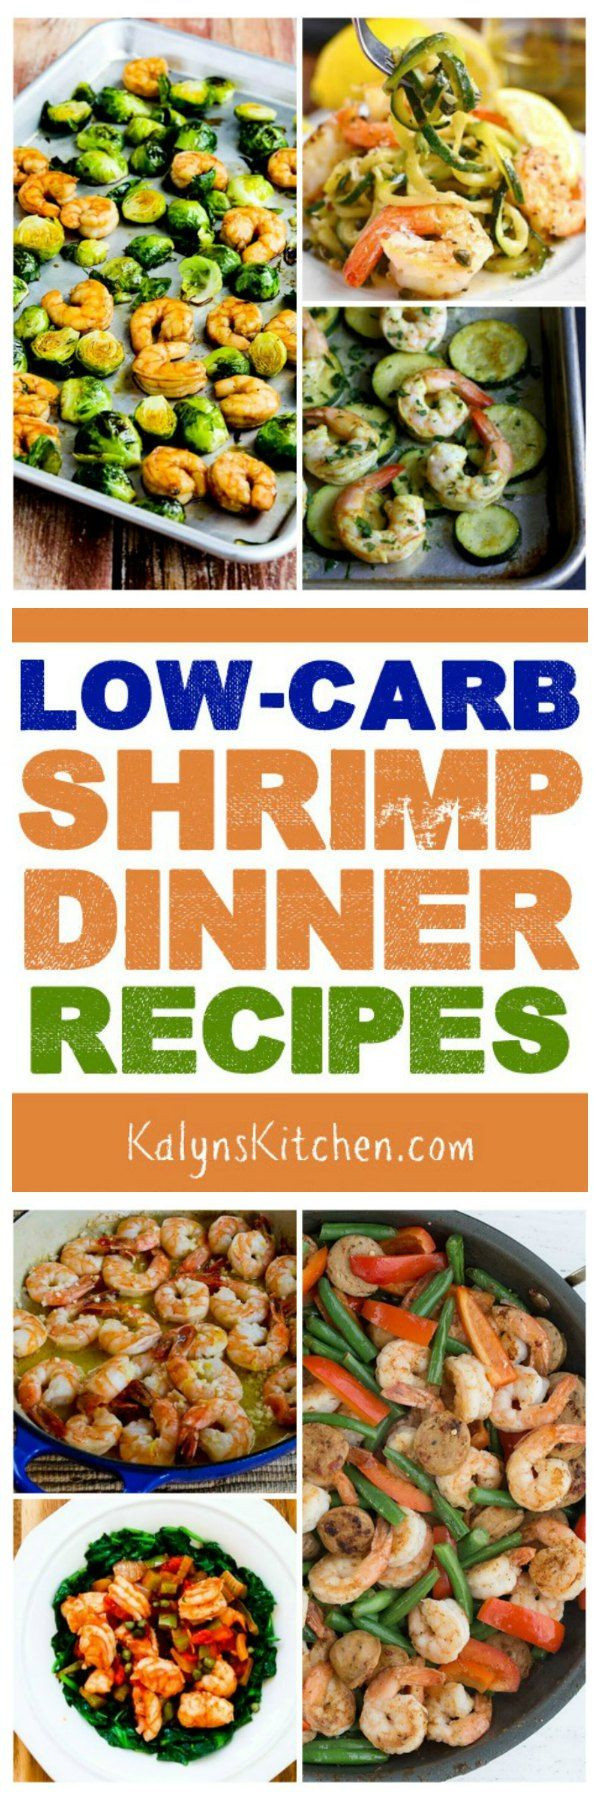 Healthy Shrimp Recipes Low Carb  Low Carb Shrimp Dinner Recipes Pinterest